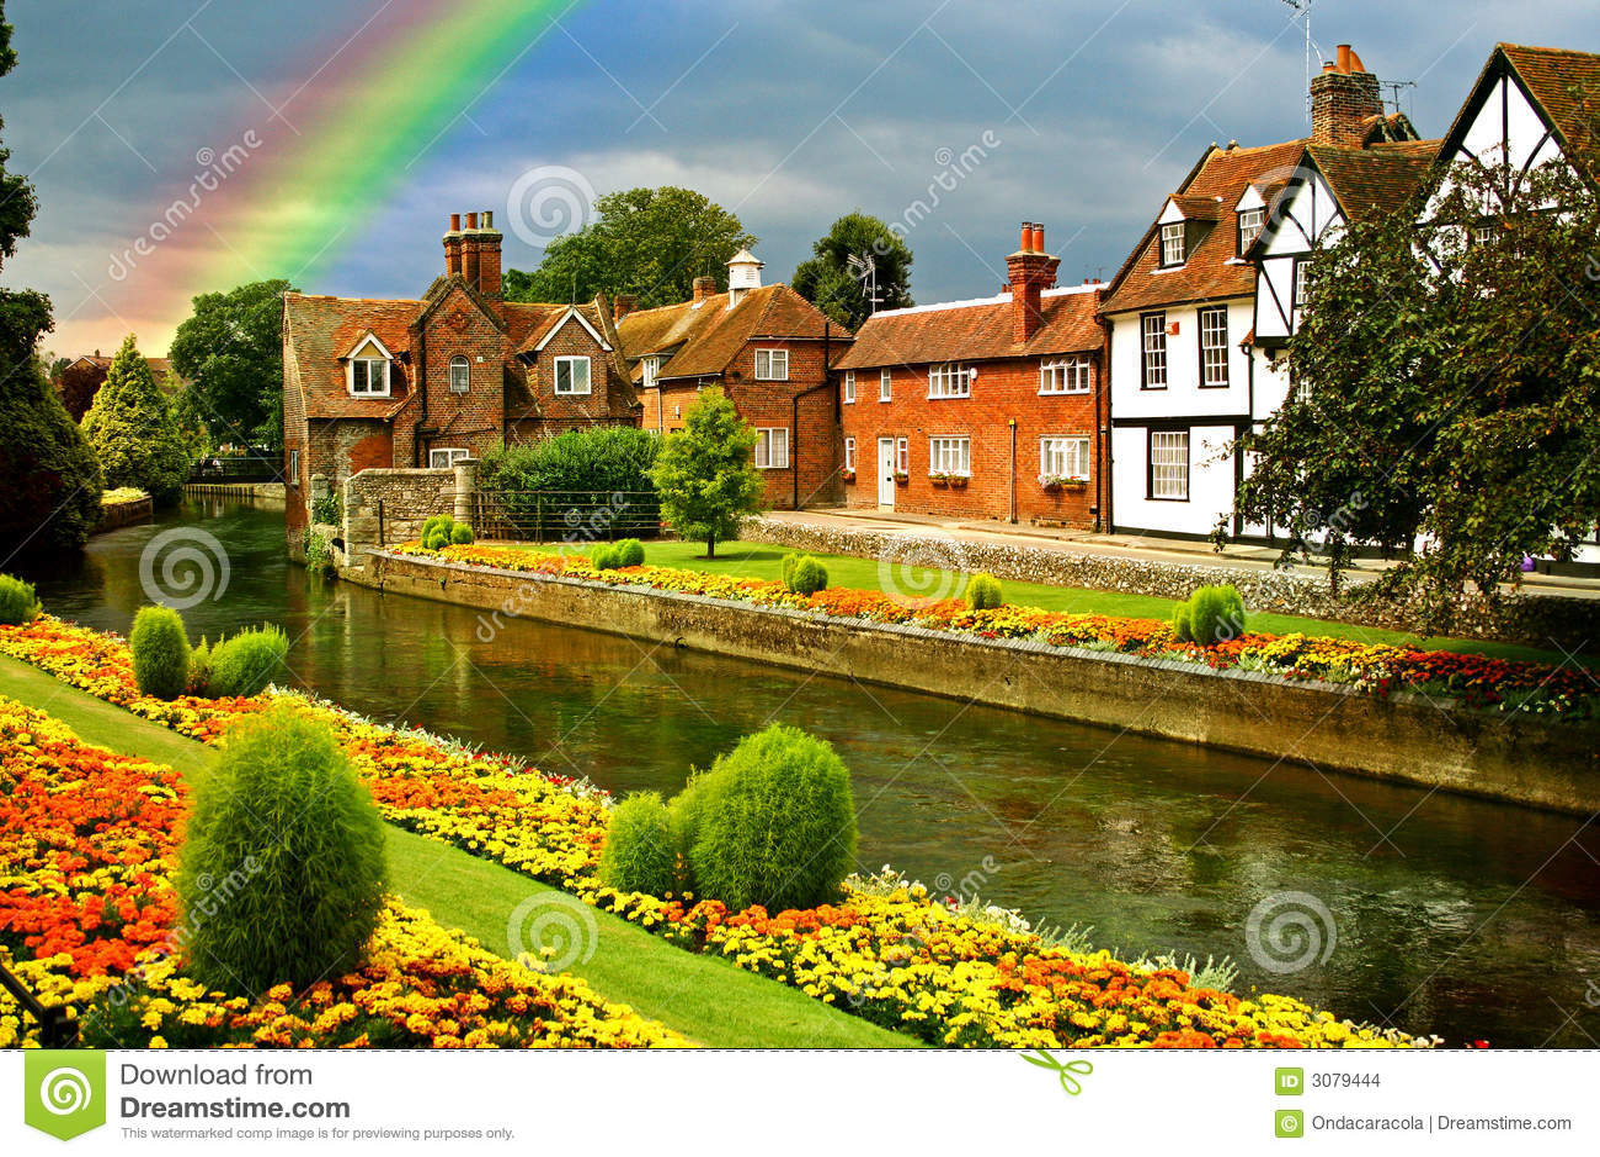 Mooie stadstuinen stock afbeeldingen afbeelding 3079444 - Casas con jardines bonitos ...